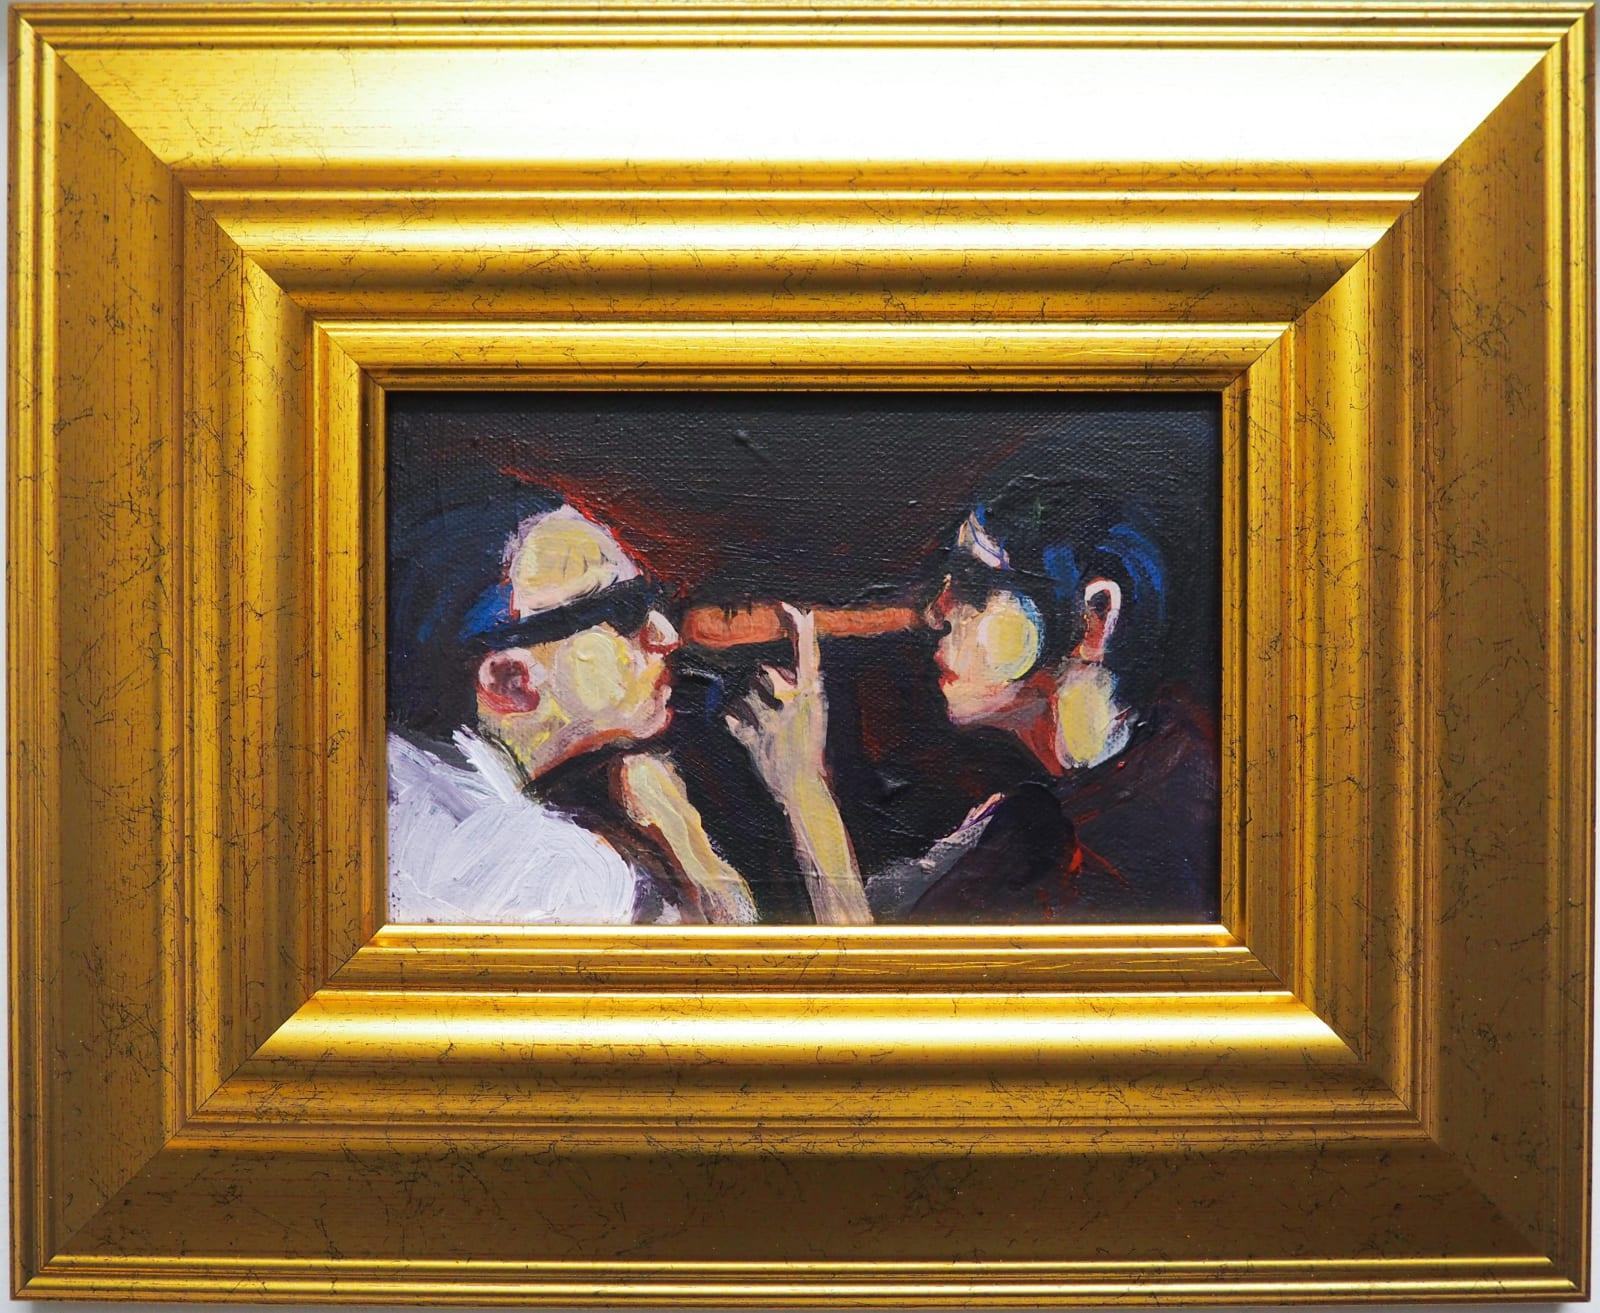 Yassine Balbzioui, orange lie, 2018 Oil on canvas 33.3 x 27.3 cm